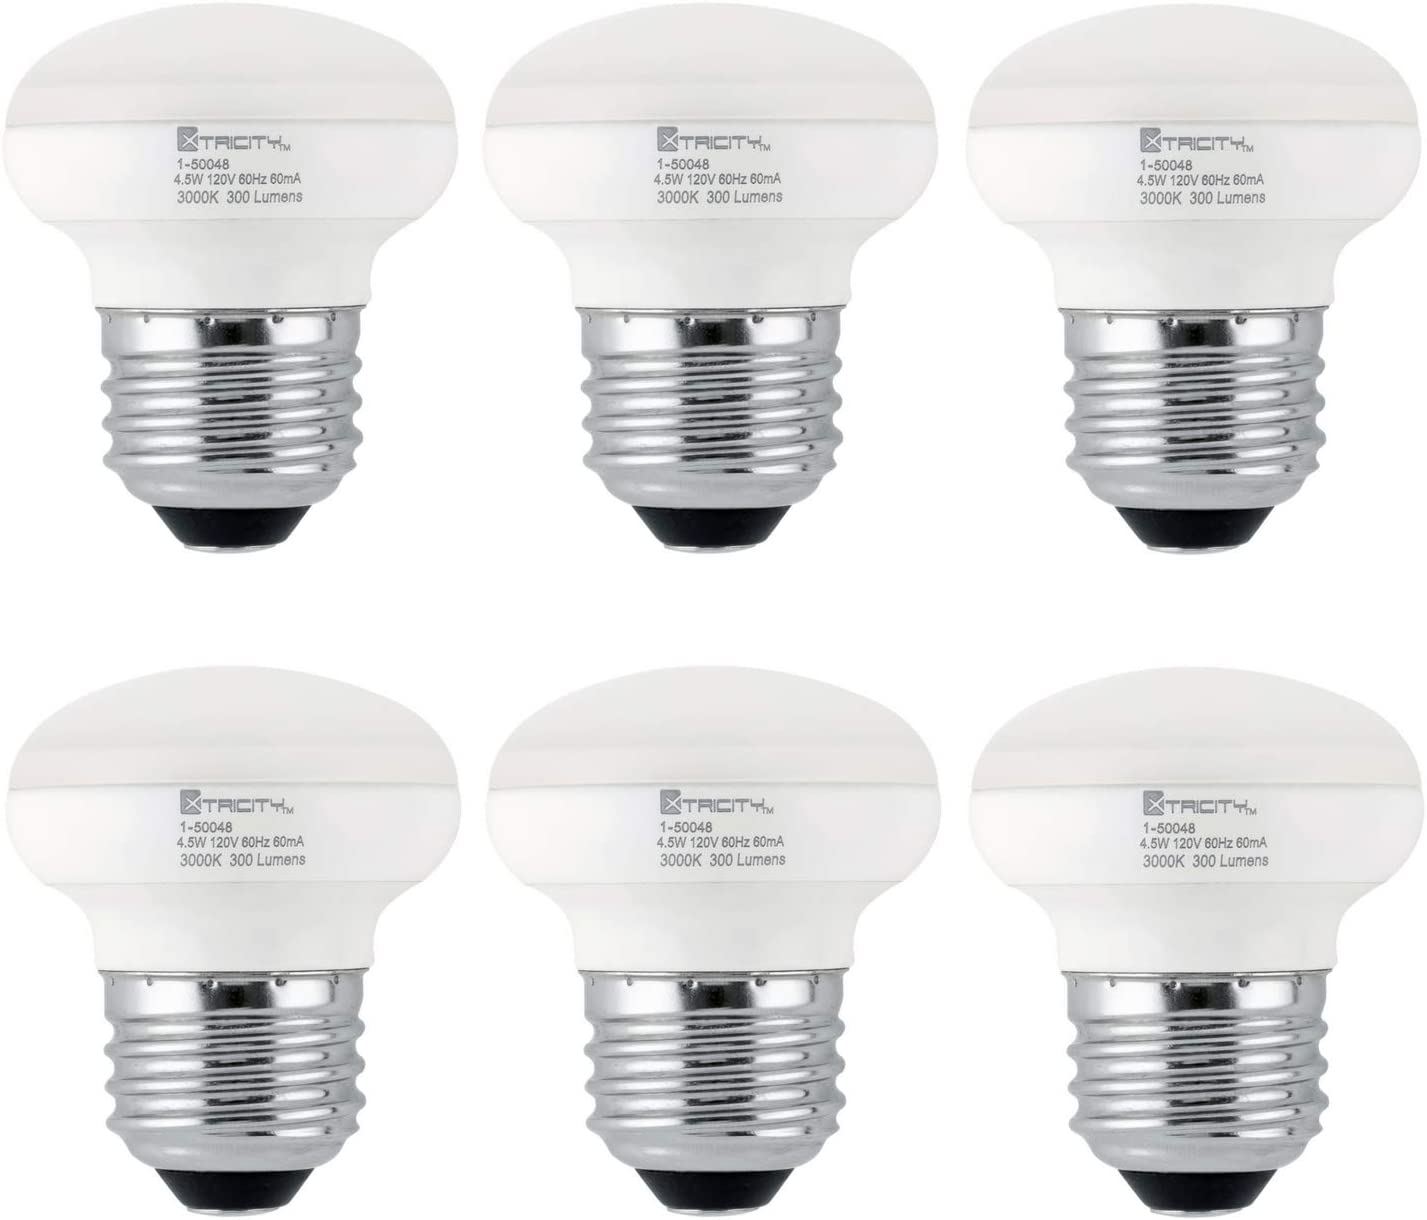 R14 LED Light Bulb, 4.5W (40W Equivalent), Dimmable, 300 Lumens, 3000k Soft White, E26 Medium Base, RoHS Compliant (6 Pack)